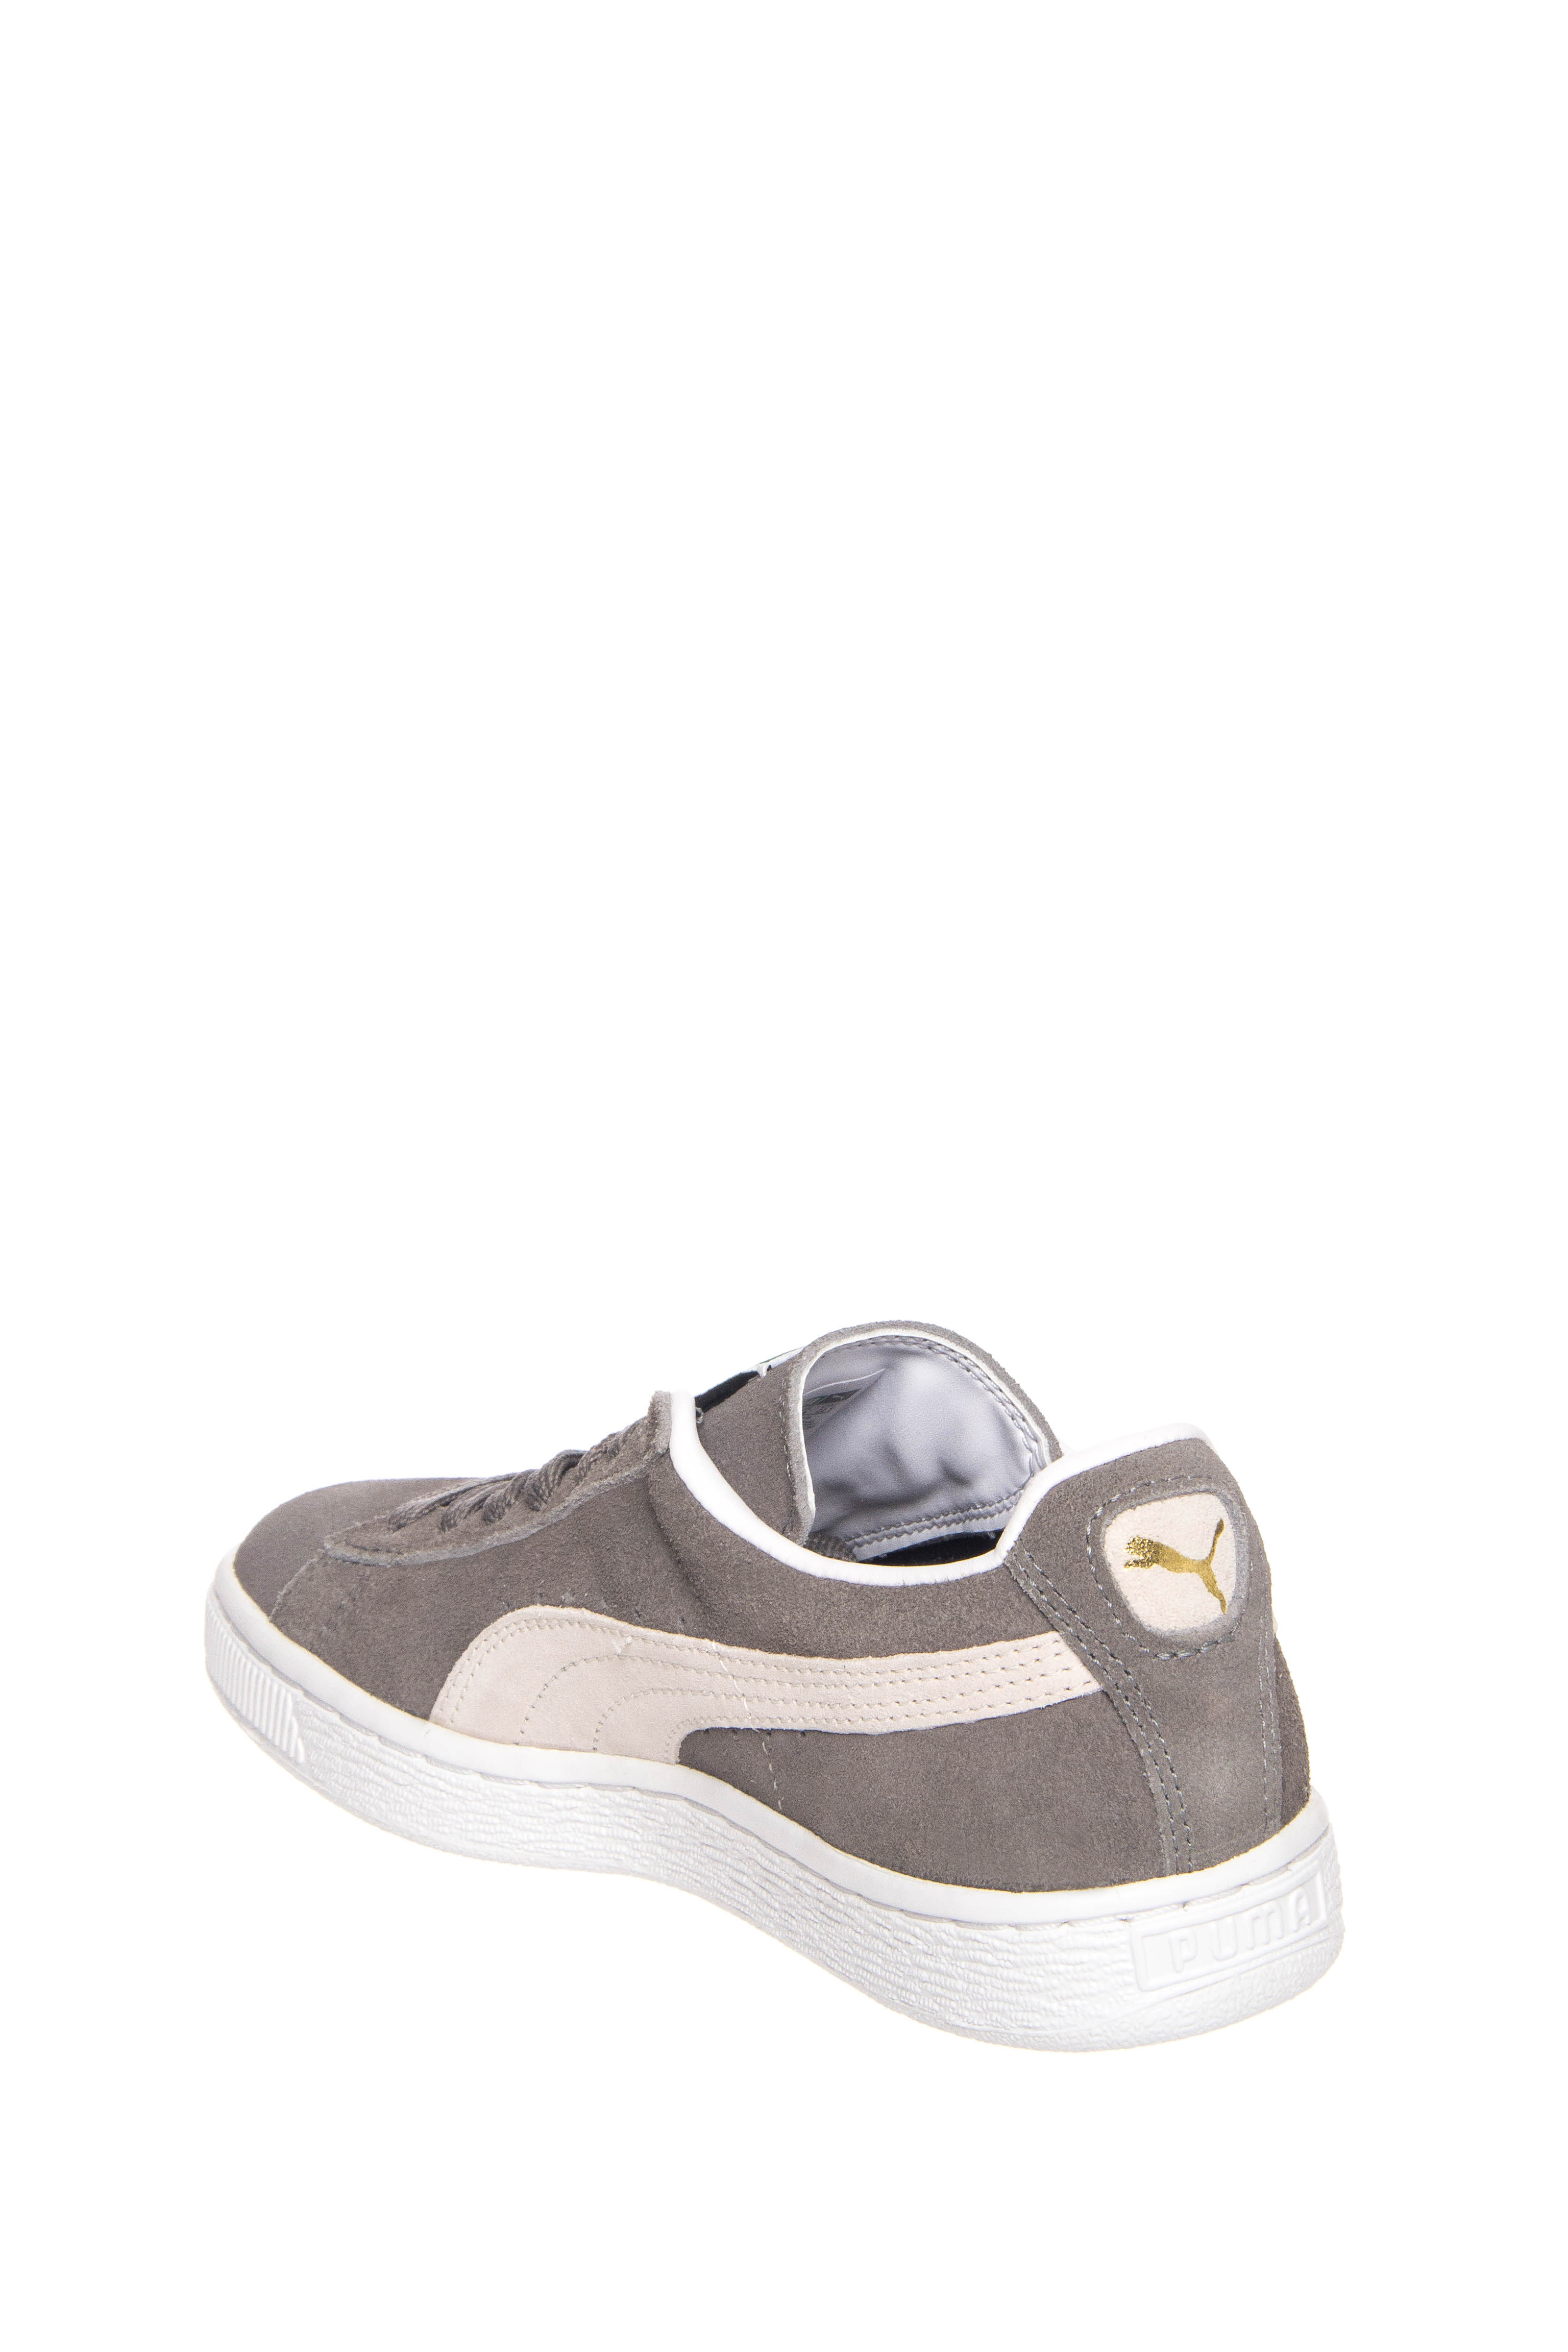 7dda0fc7711d Puma 35263466 Unisex Suede Classic Plus Low Top Sneakers - Steeple Grey    White